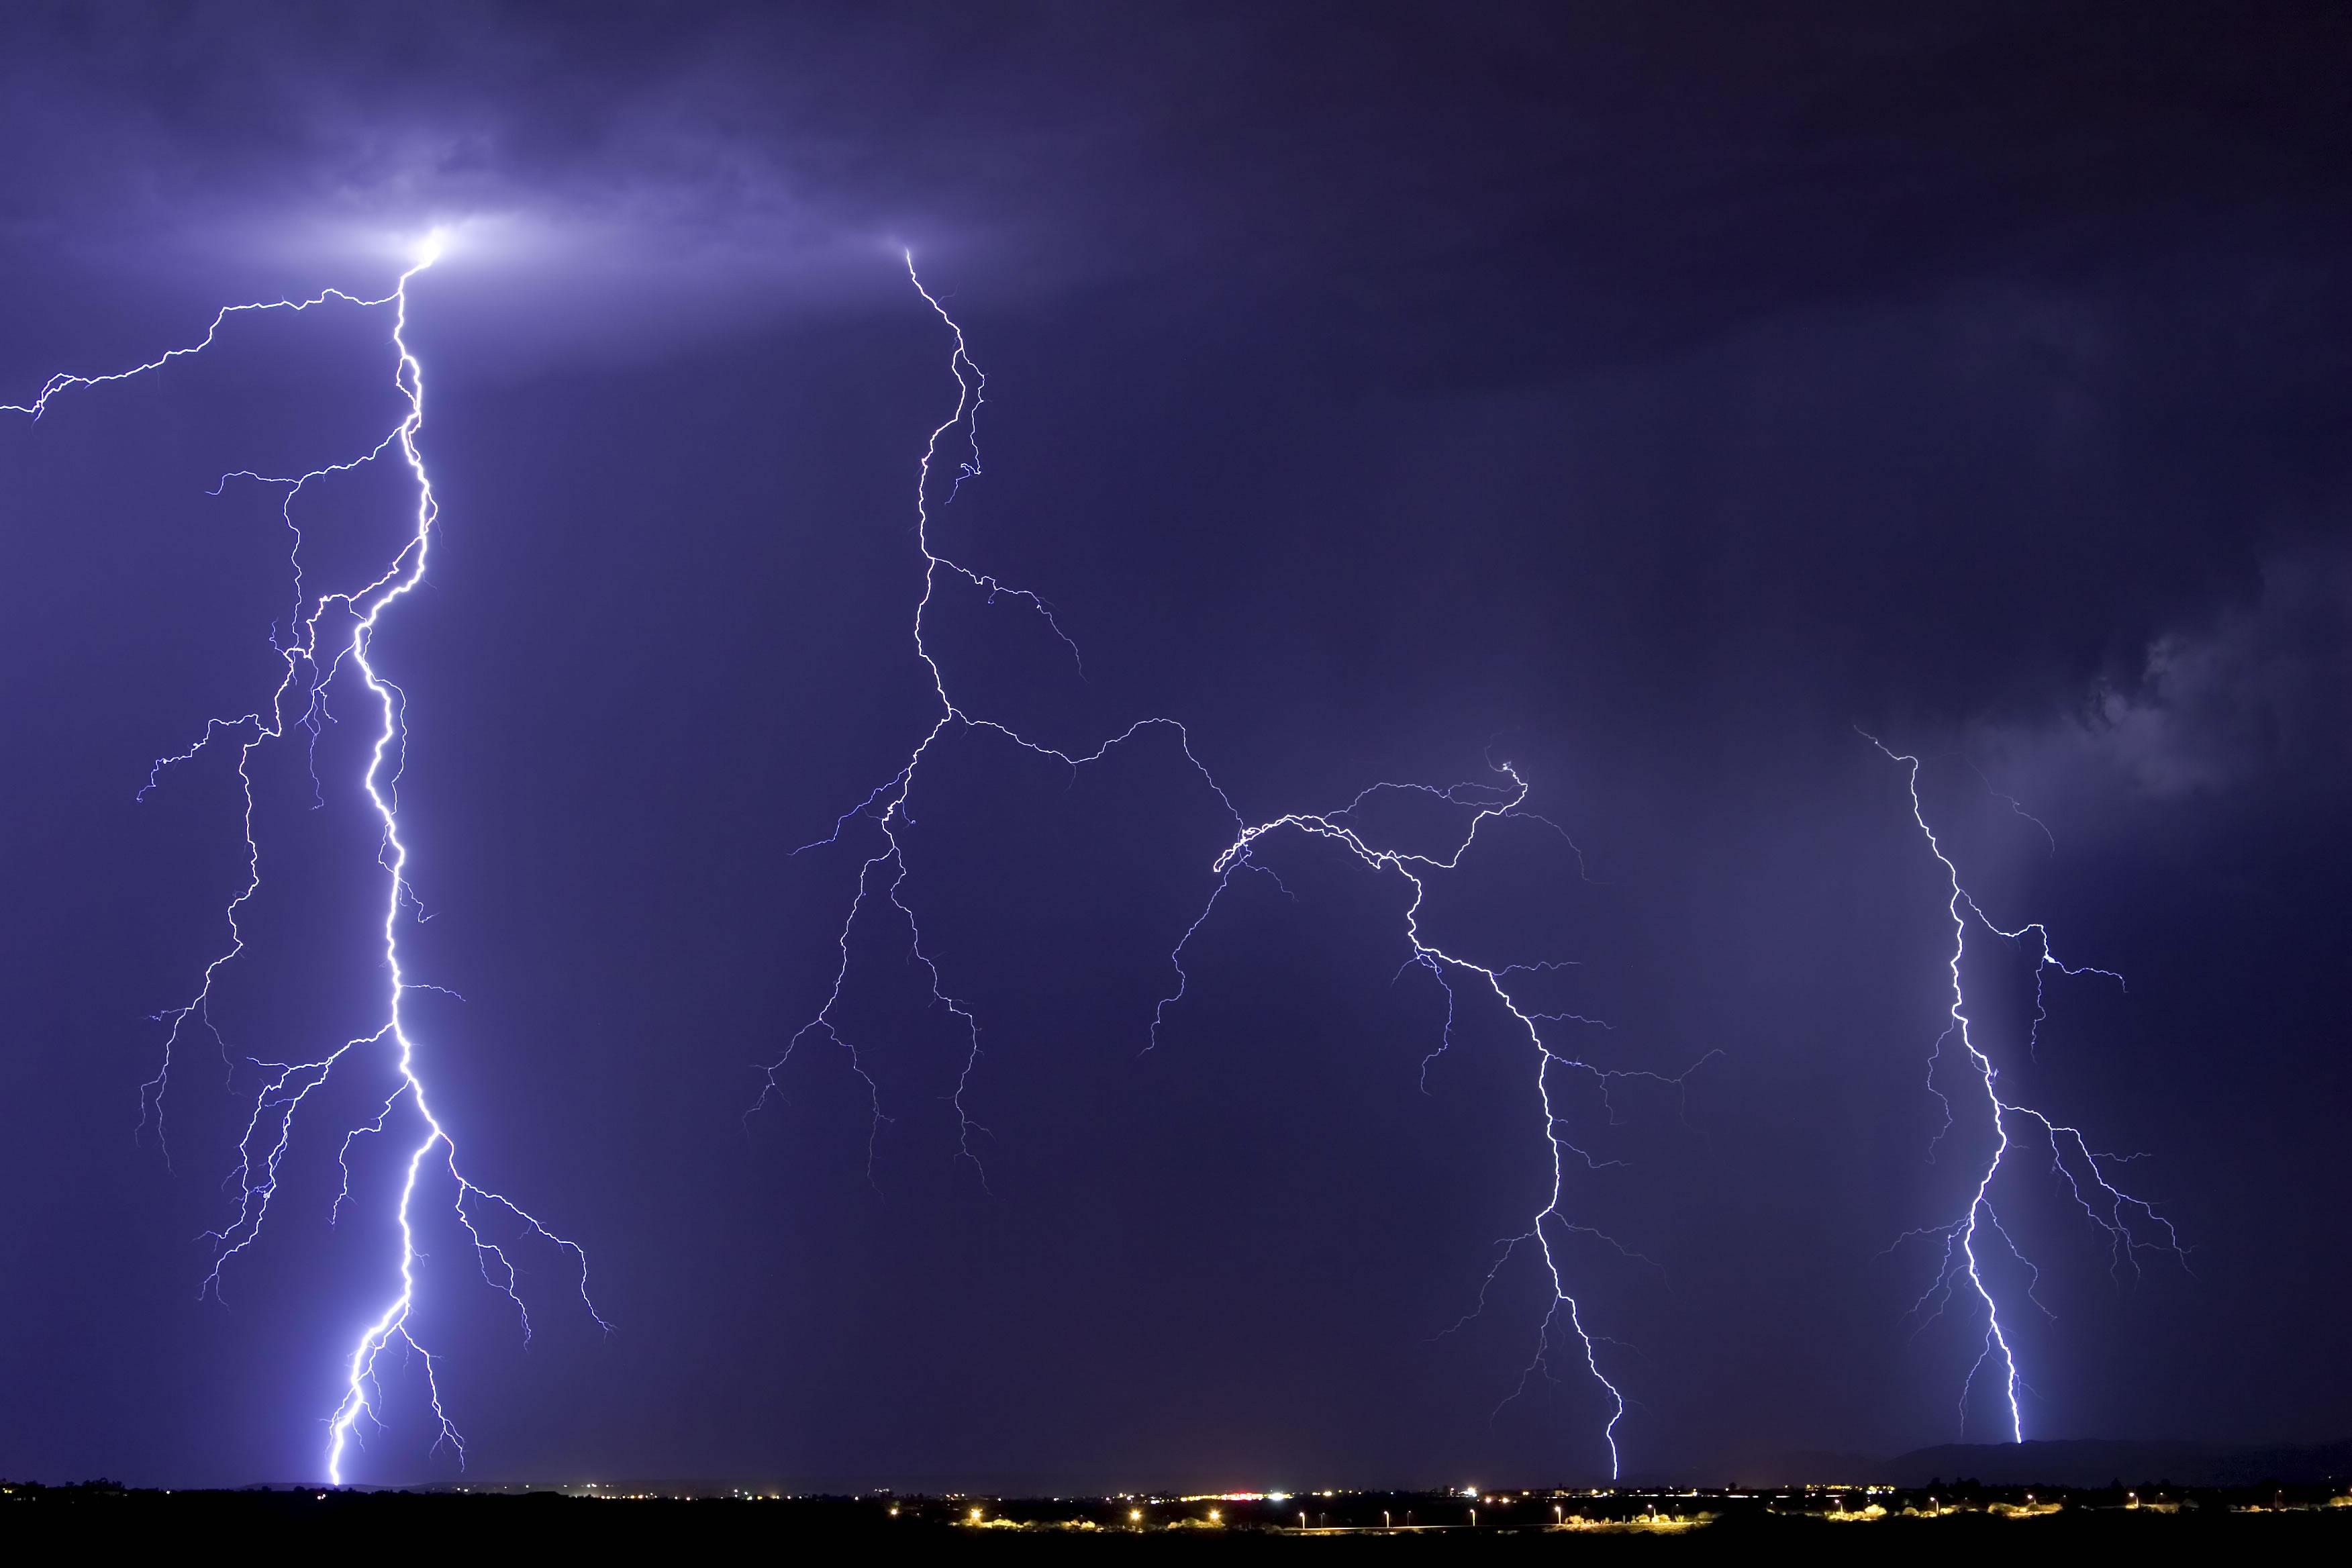 Lightning Storms Photoshop 3504 x 2336